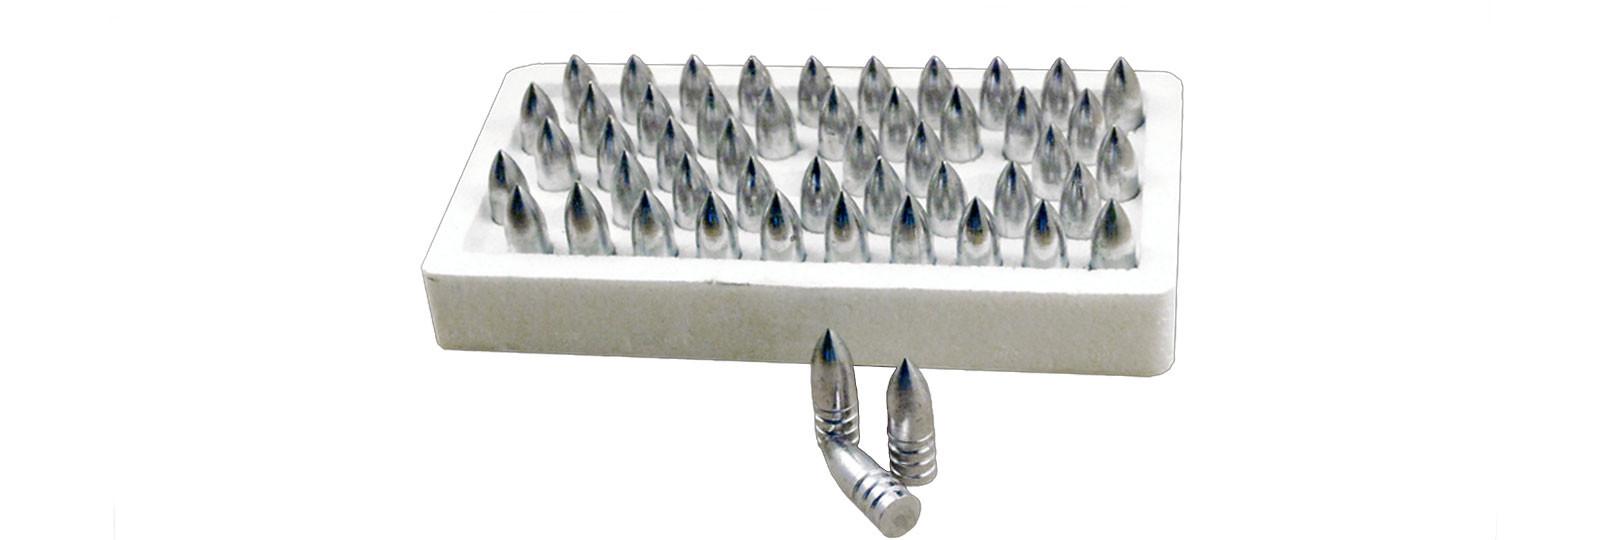 Set 50 Spitzer bullet